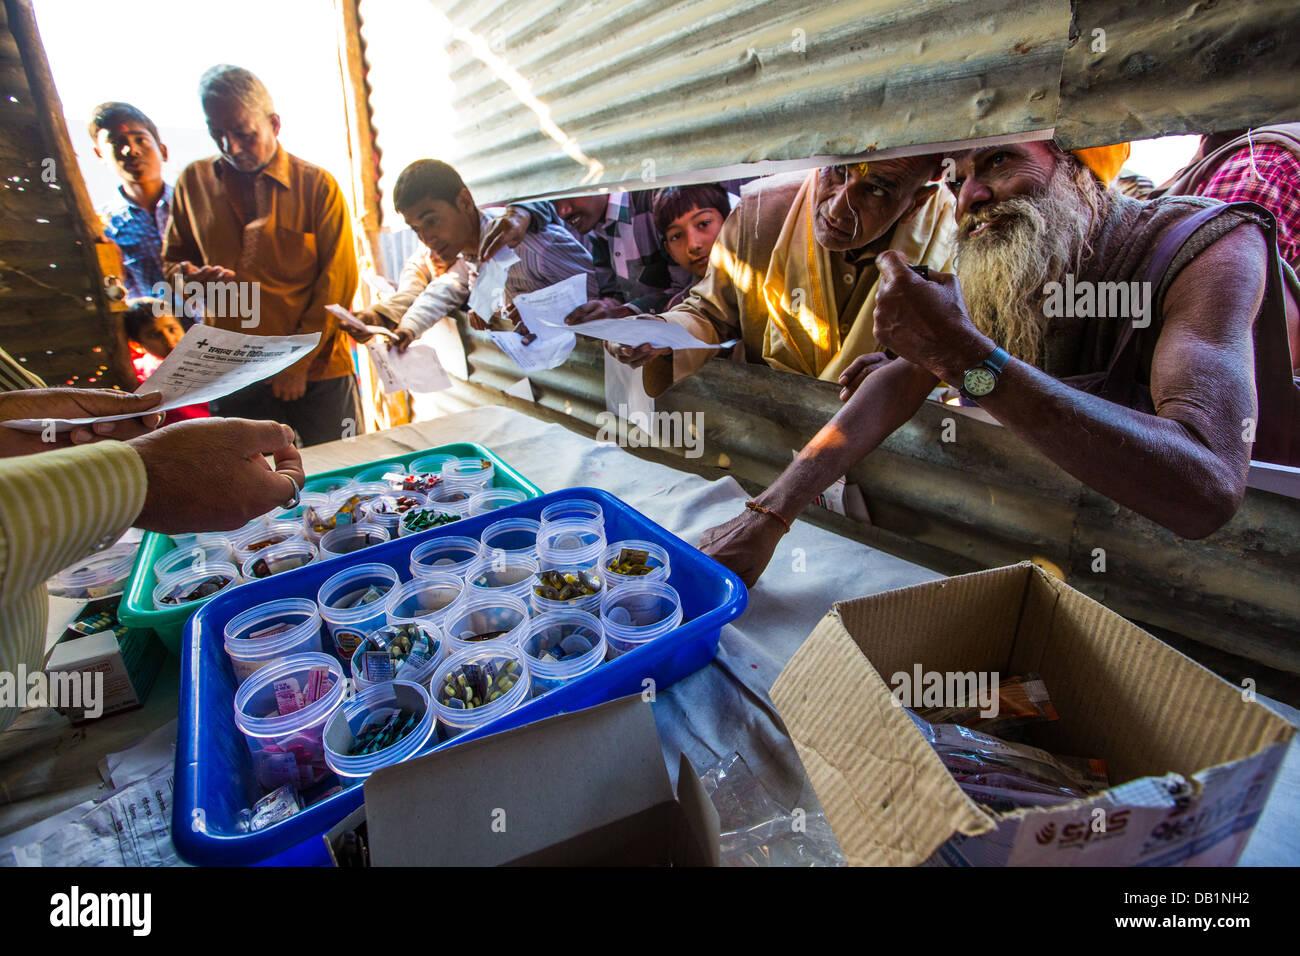 Les gens recueillir des médicaments dans un dispensaire de champ à la Kumbh Mela à Allahabad, Inde Photo Stock